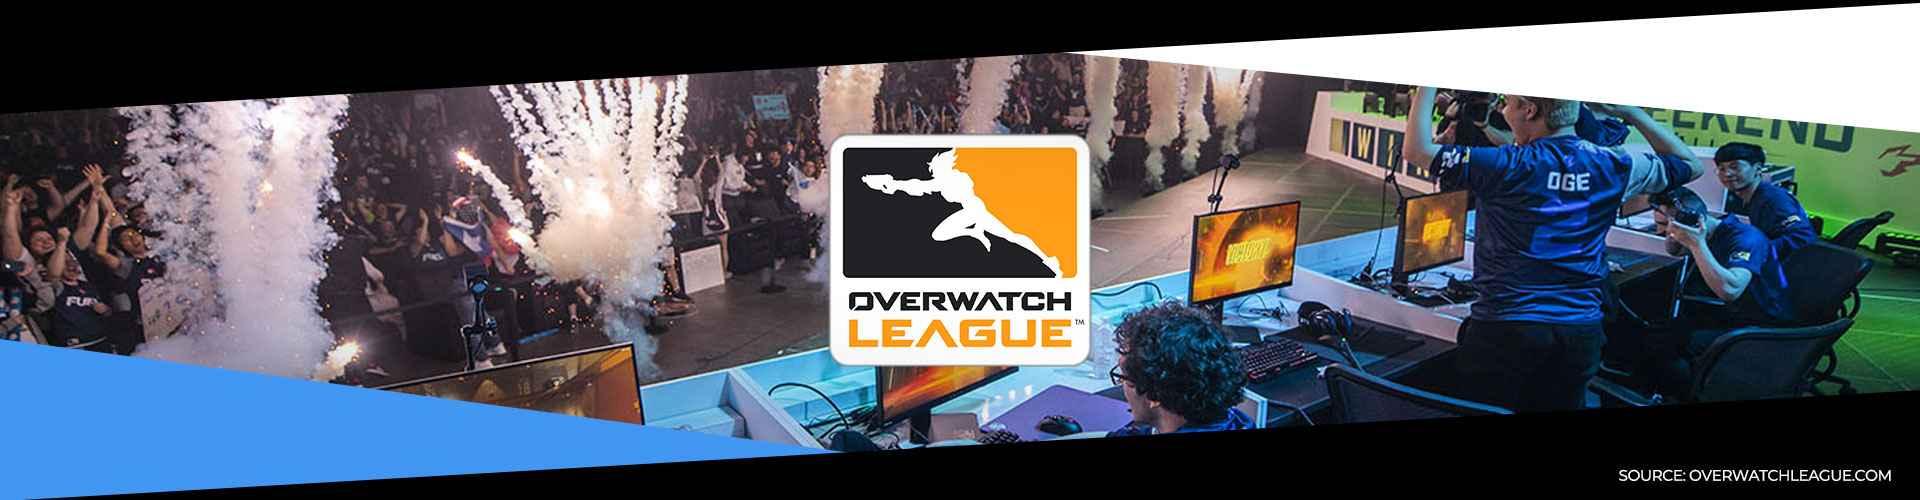 Overwatch League 2019 - Kausi 2, Vaihe 2